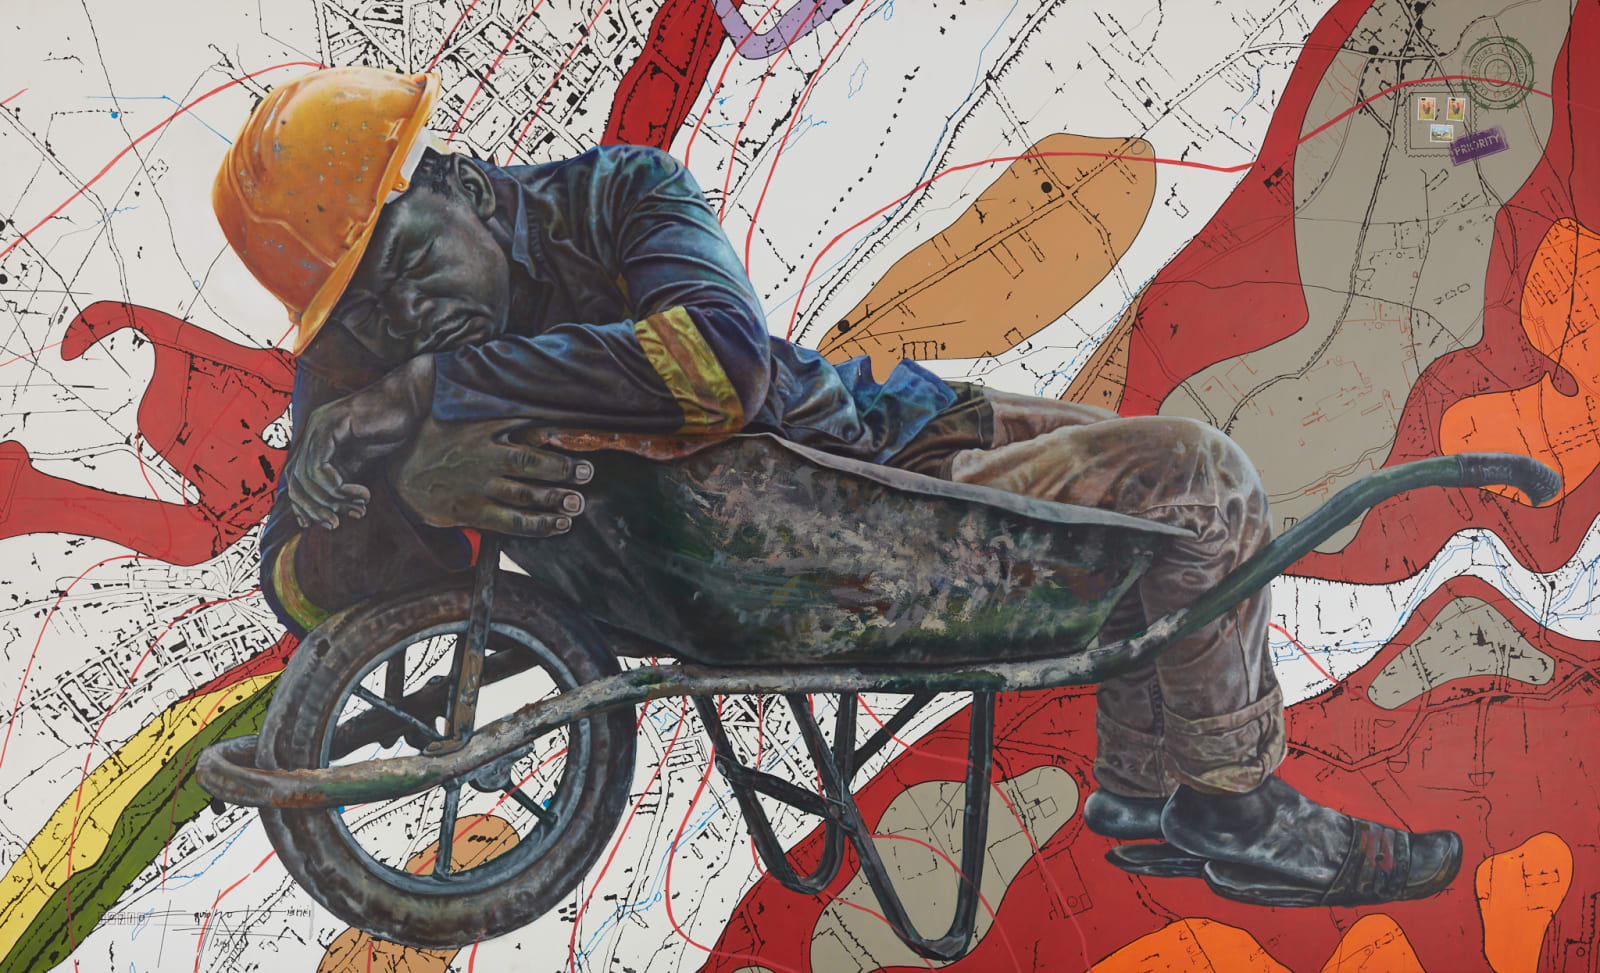 Jean David Nkot  hpp//.www.ASTRAL TRAVEL.NET, 2019  Acrylic & Posca on canvas  66 7/8 x 110 1/4 in  170 x 280 cm